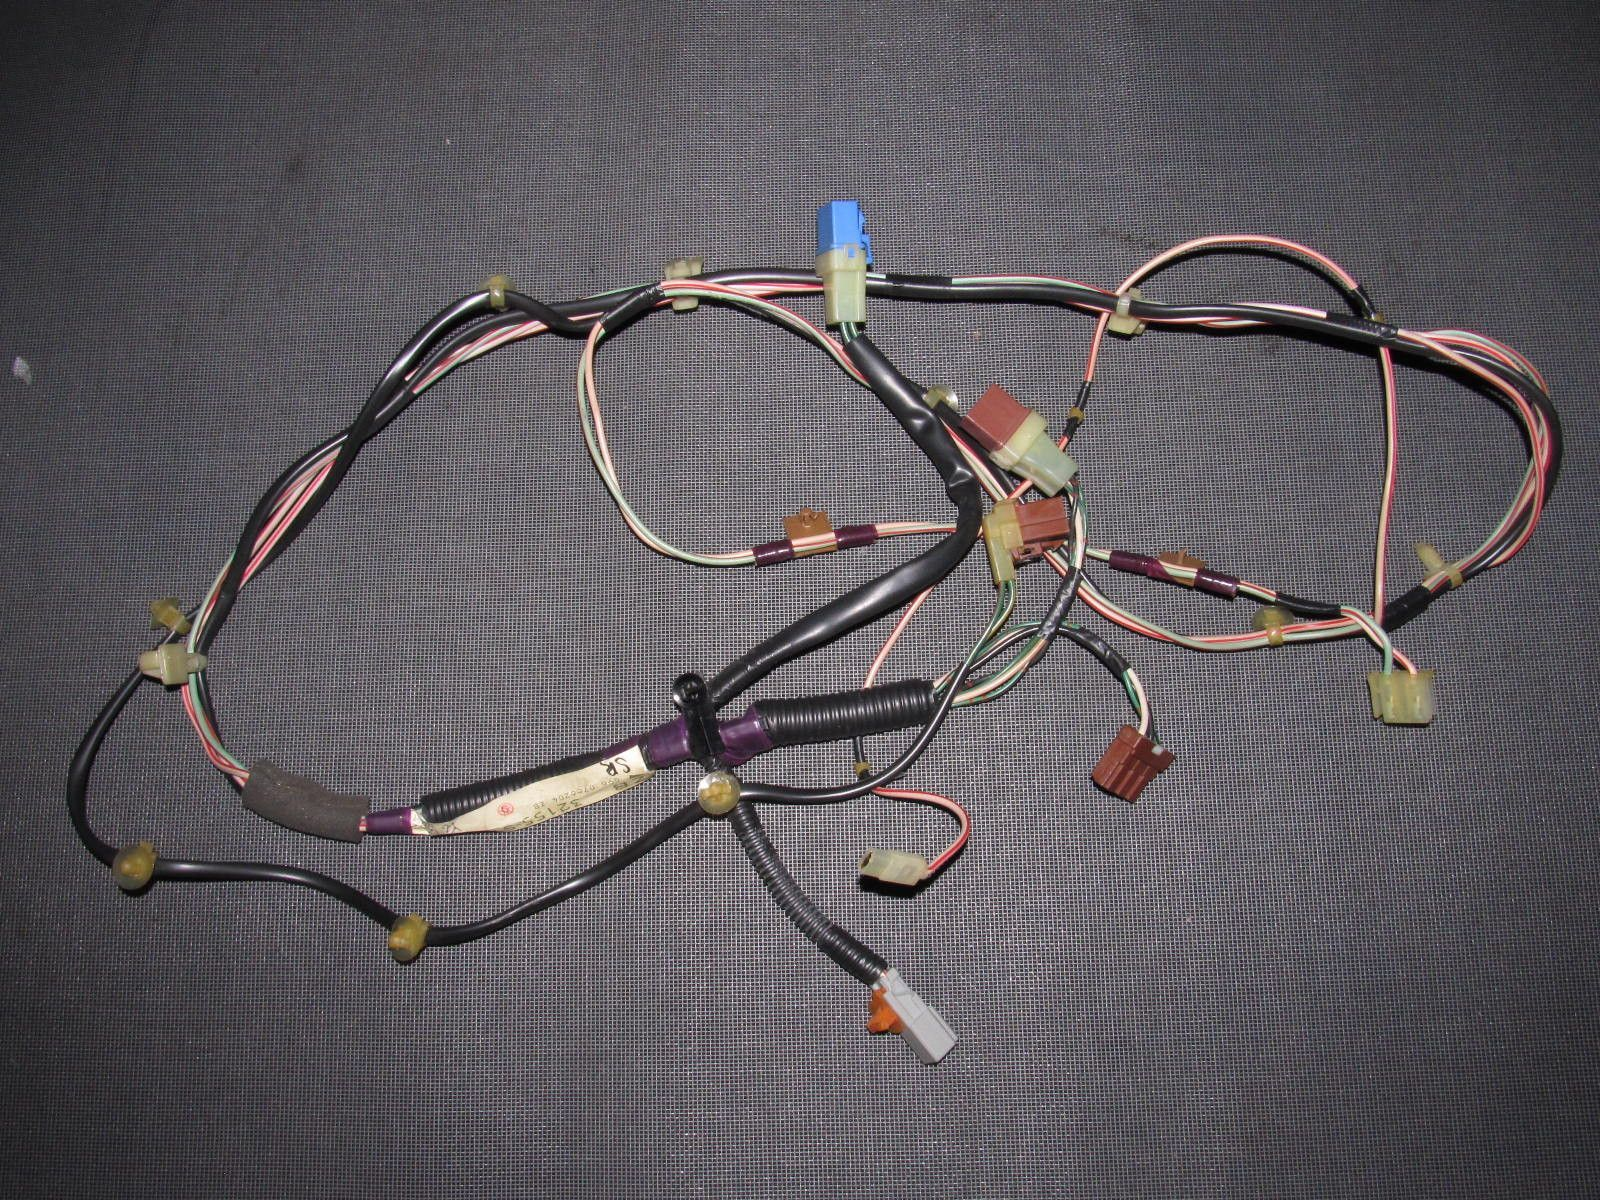 94 01 acura integra oem coupe headliner sunroof motor map lamp light wiring harness [ 1600 x 1200 Pixel ]